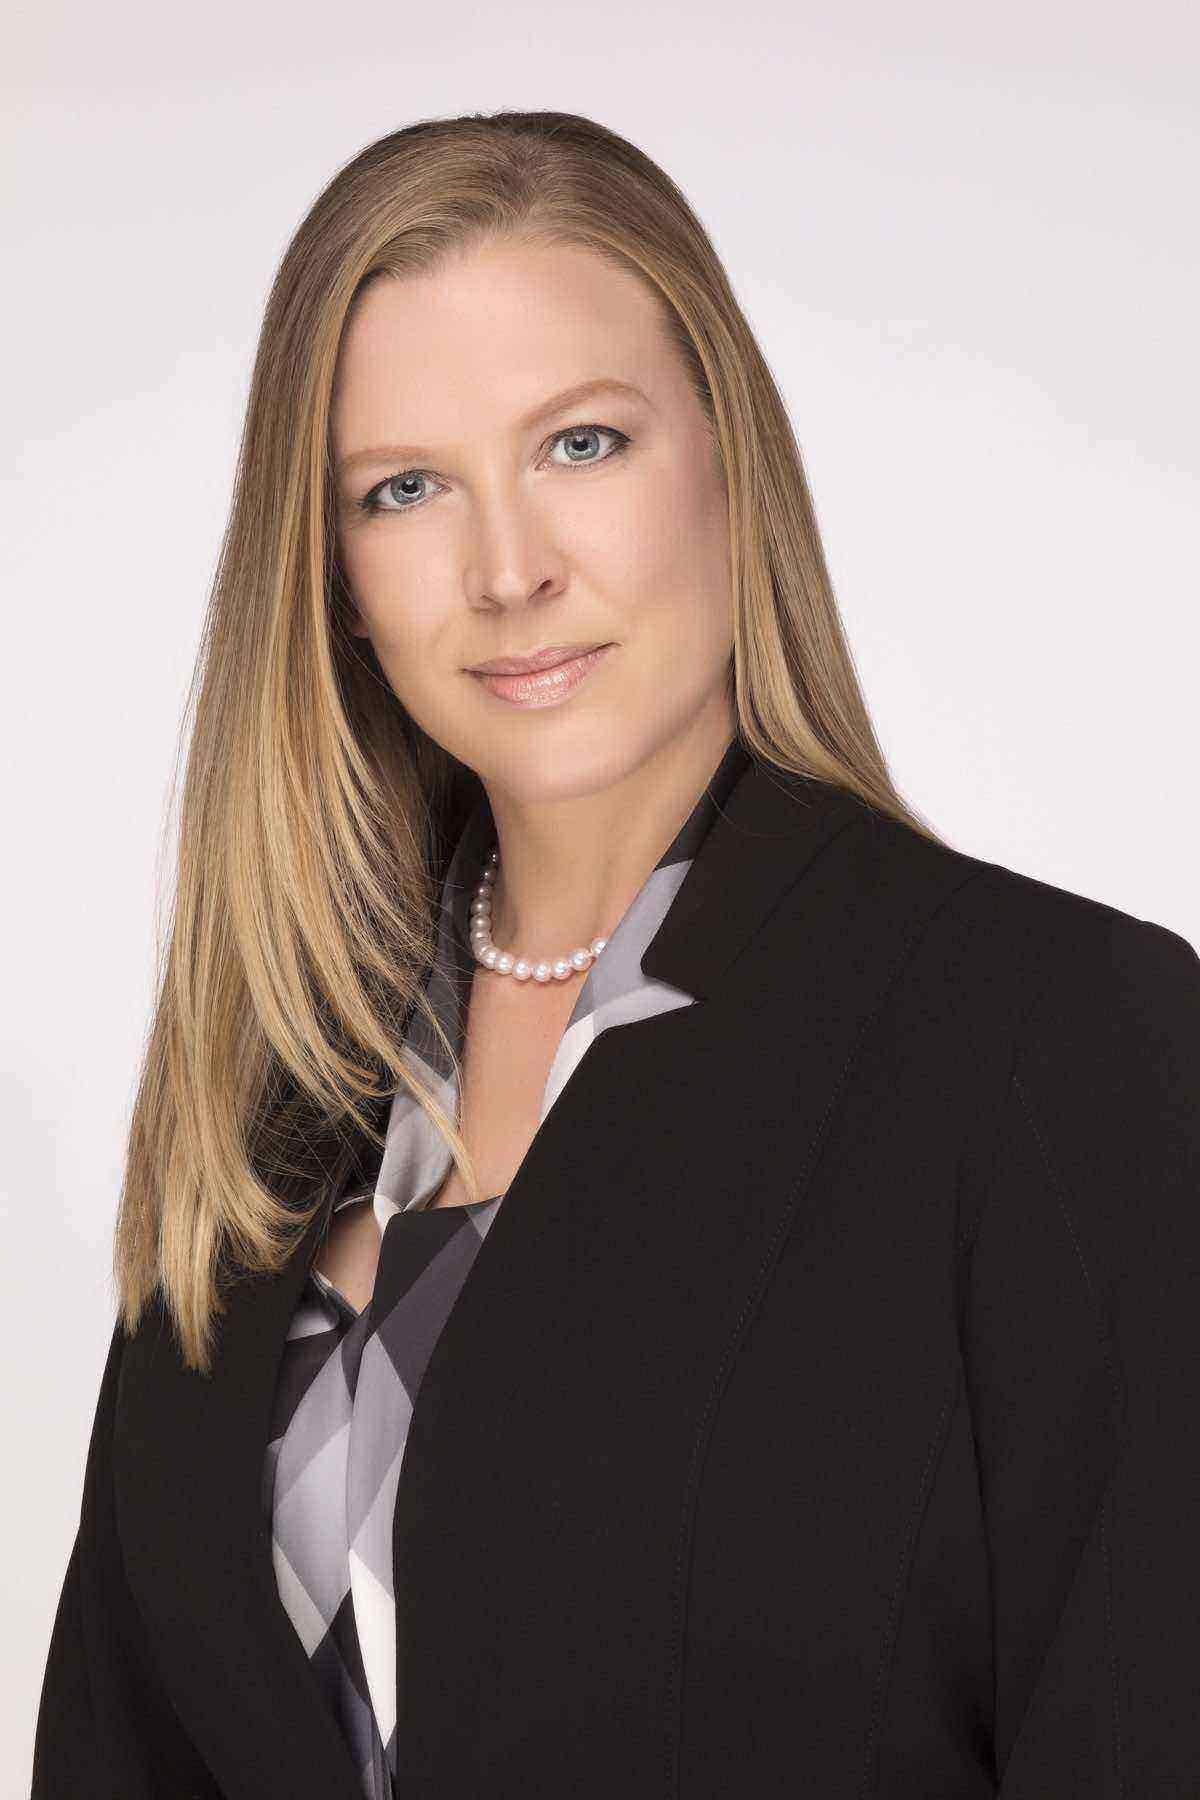 Linda Leahy